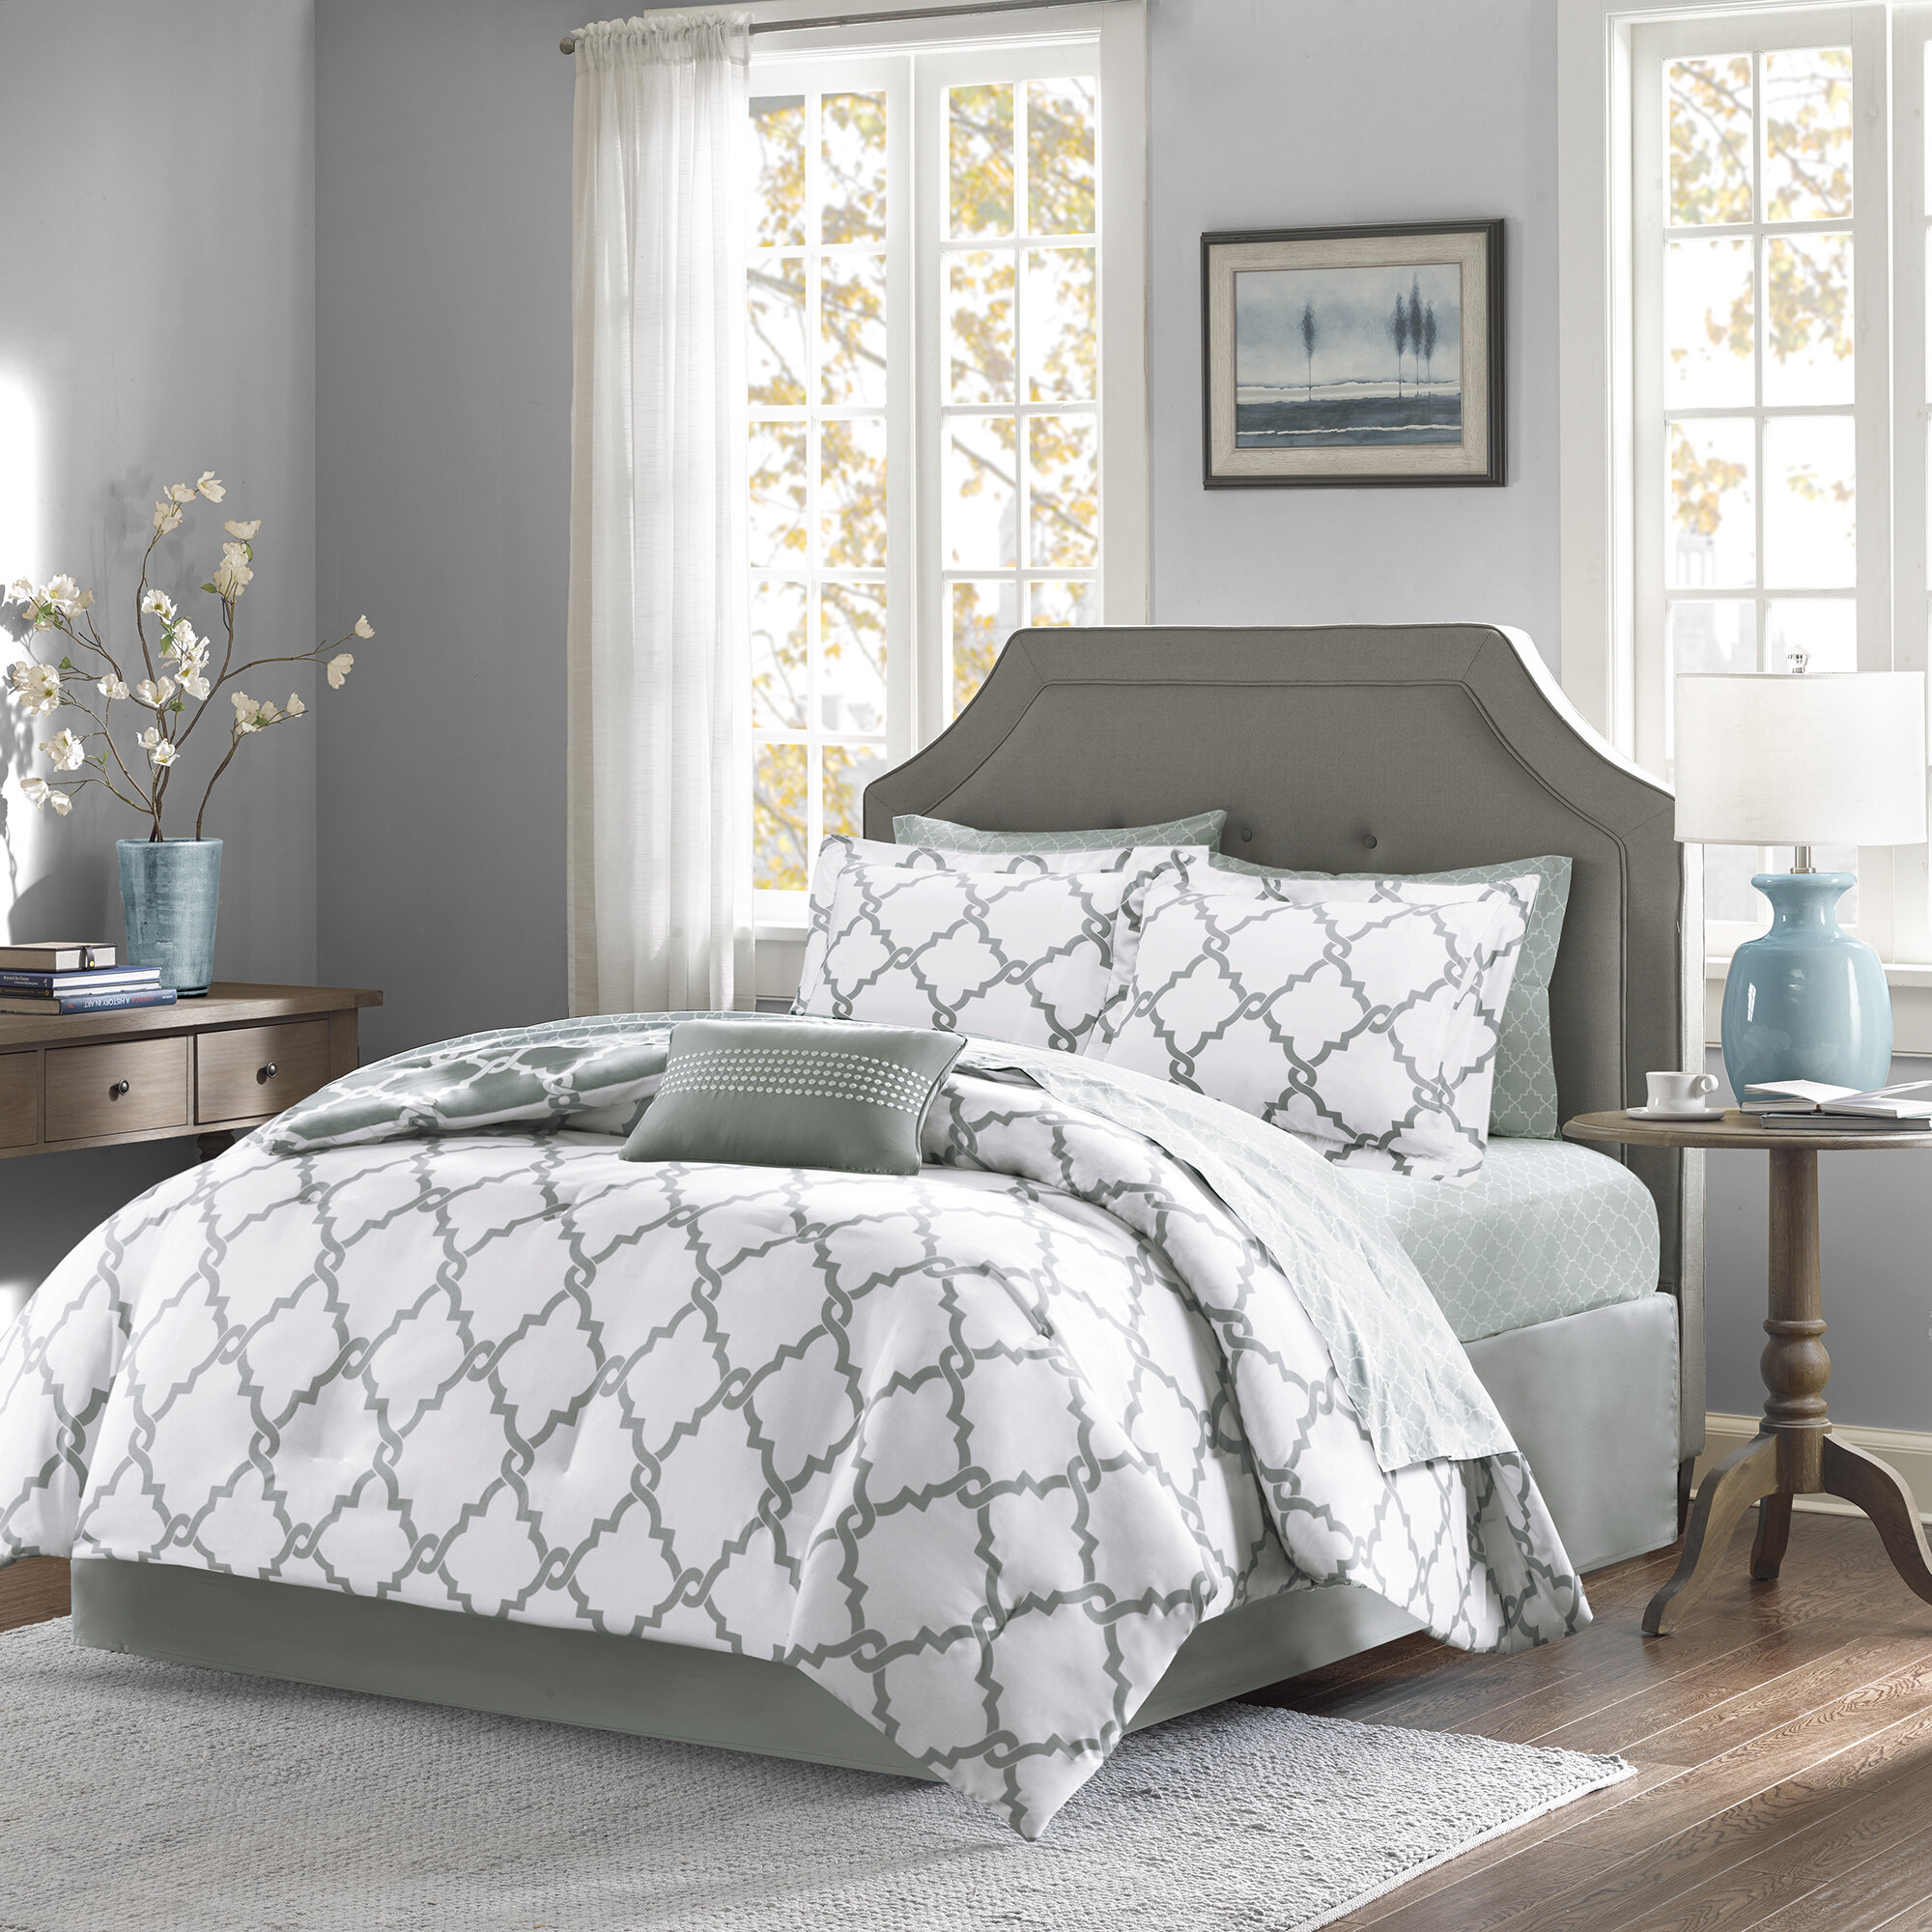 Willa Arlo Interiors Geometric 7 Piece Bed In A Bag Reversible Comforter Reviews Wayfair Ca